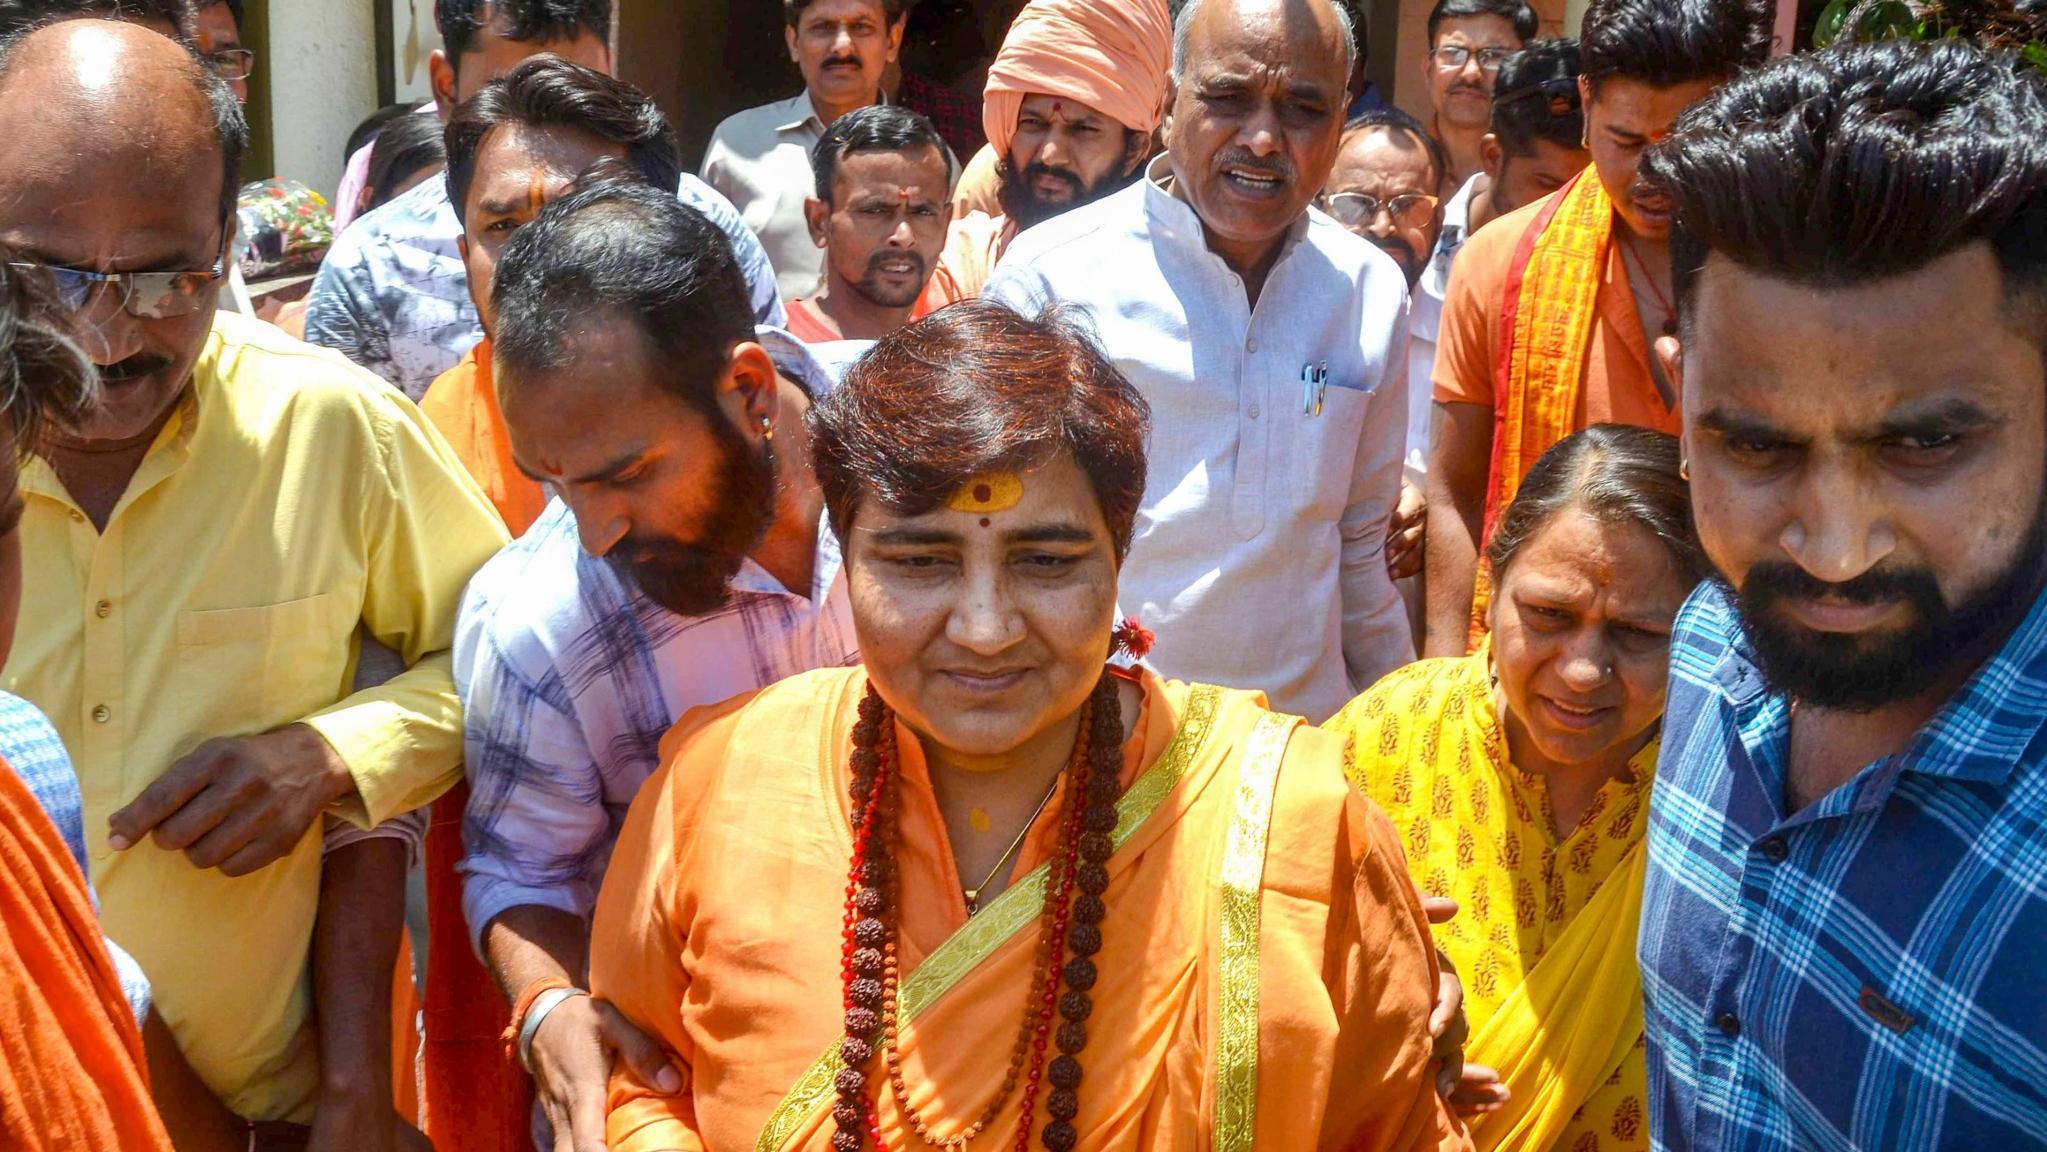 'Right Decision': BJP Leaders Defend Pragya Thakur's Candidature